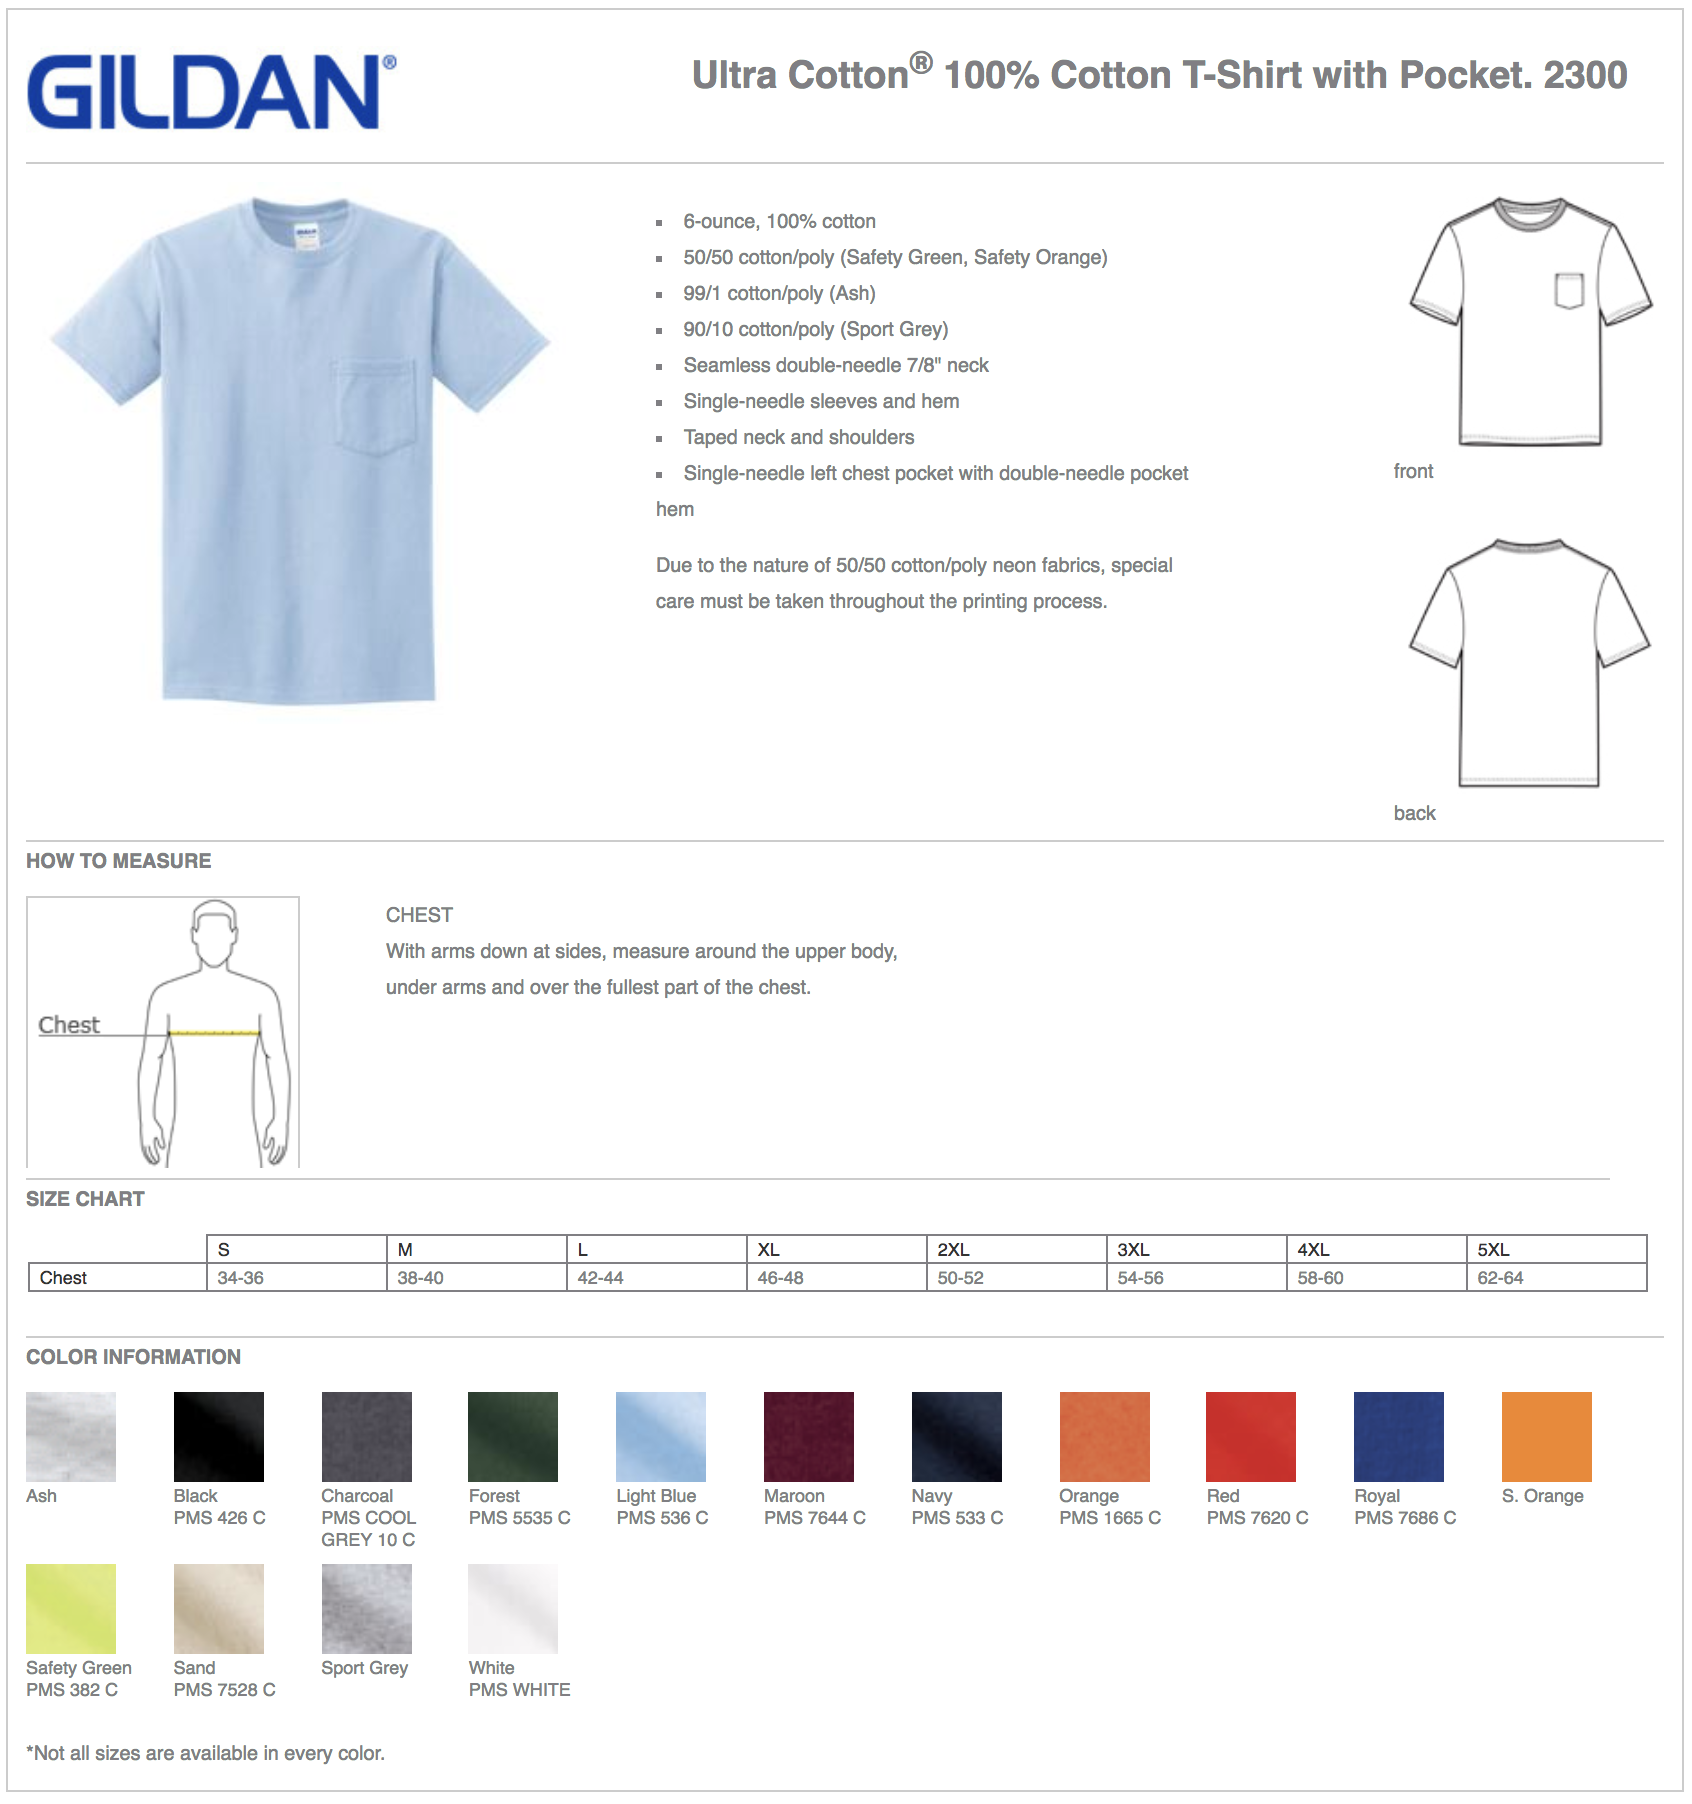 Gildan 2300 Custom T-Shirts with Pocket